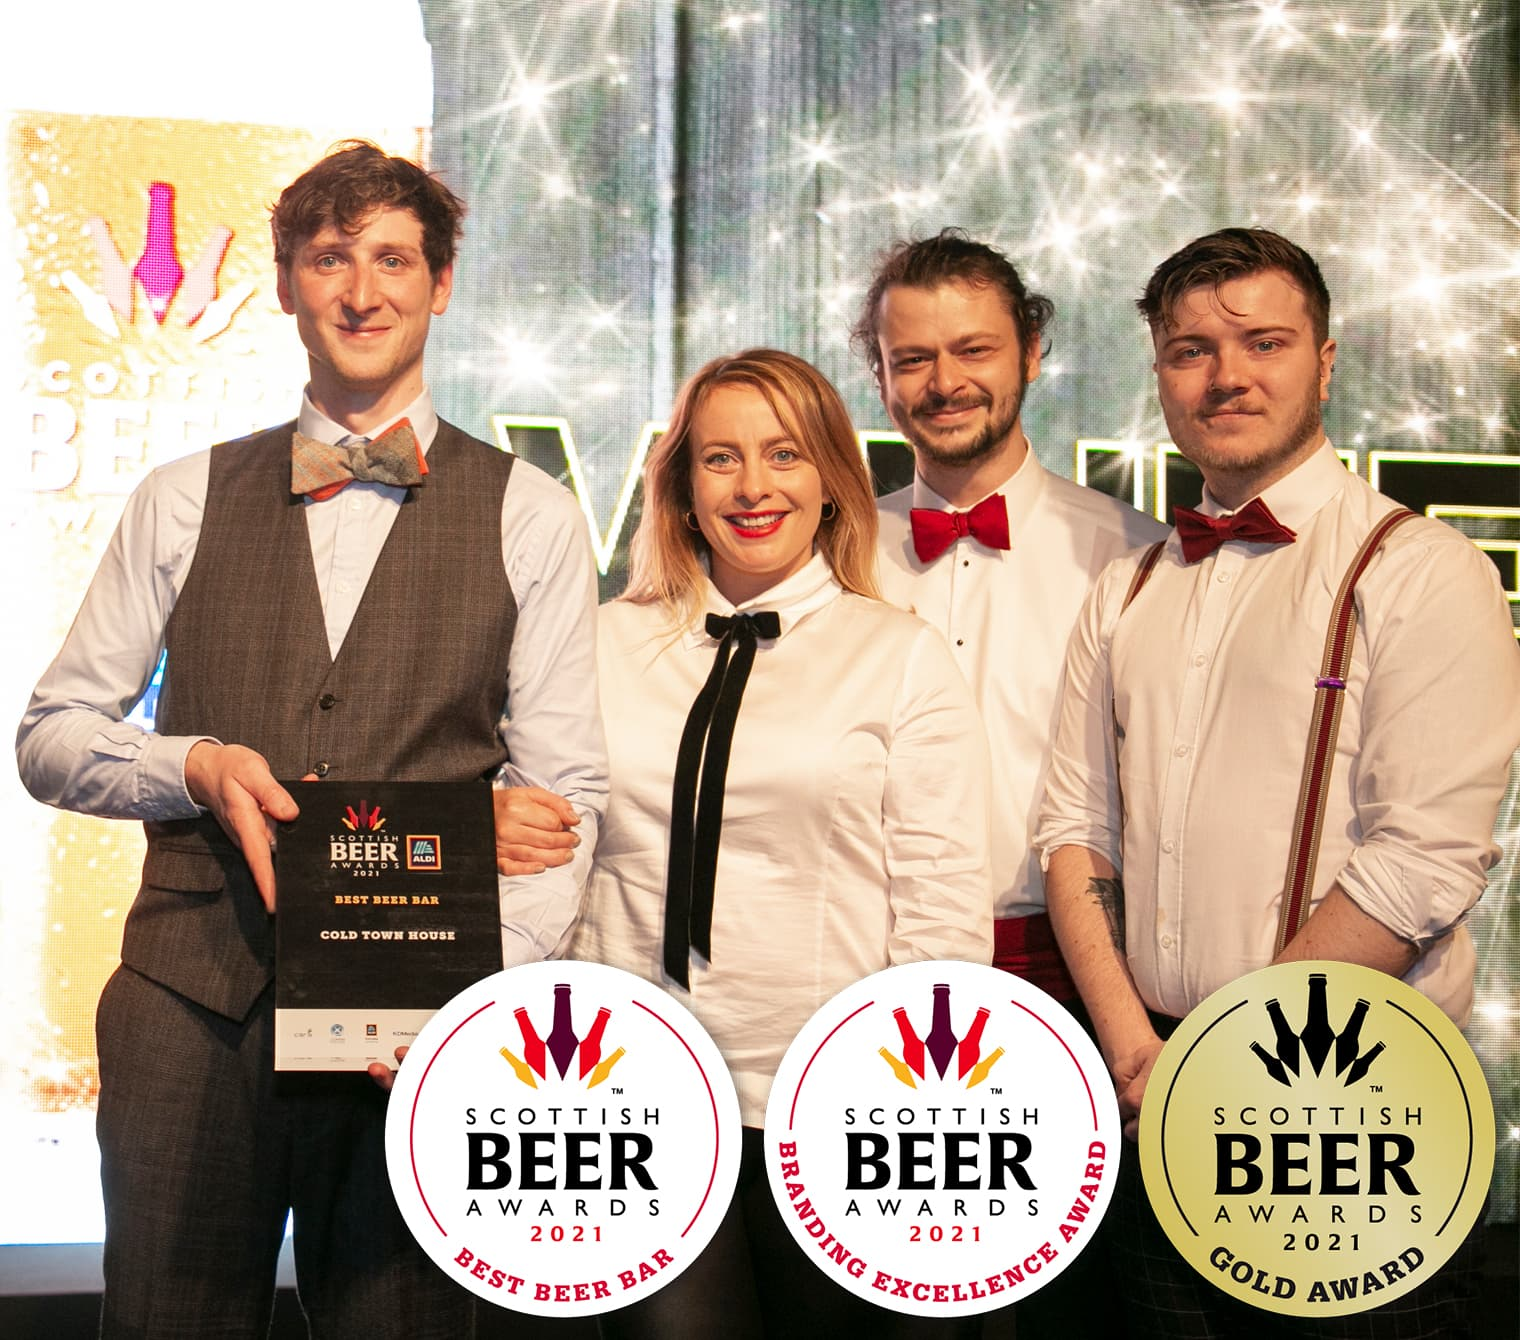 Cold Town Beer Scottish Beer Award Winners 2021